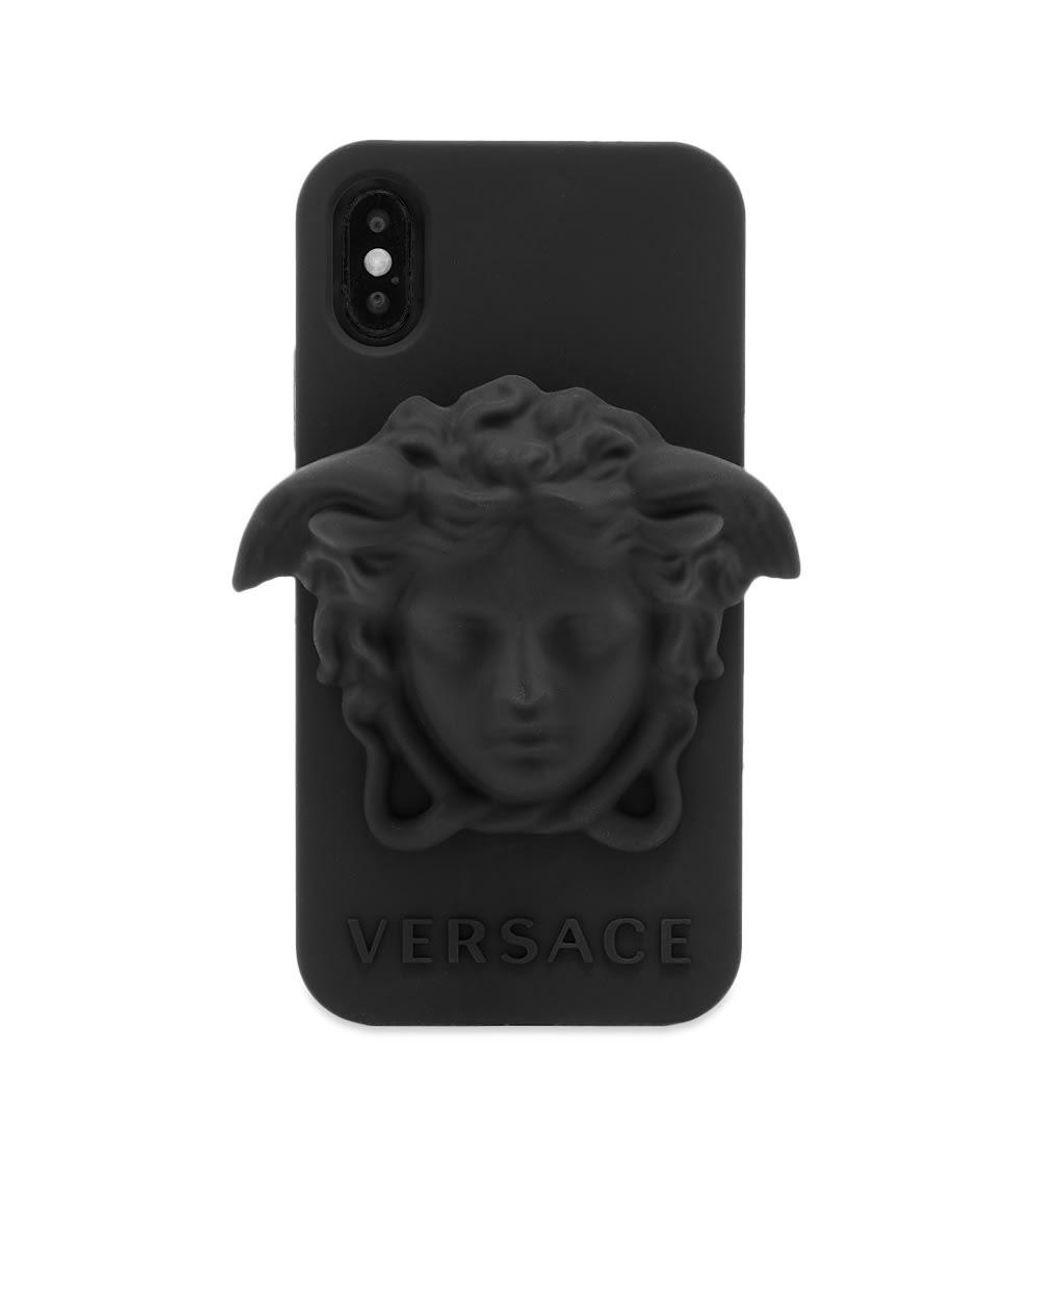 Custodia Medusa per iPhone X in silicone - Versace Uomo  Shop